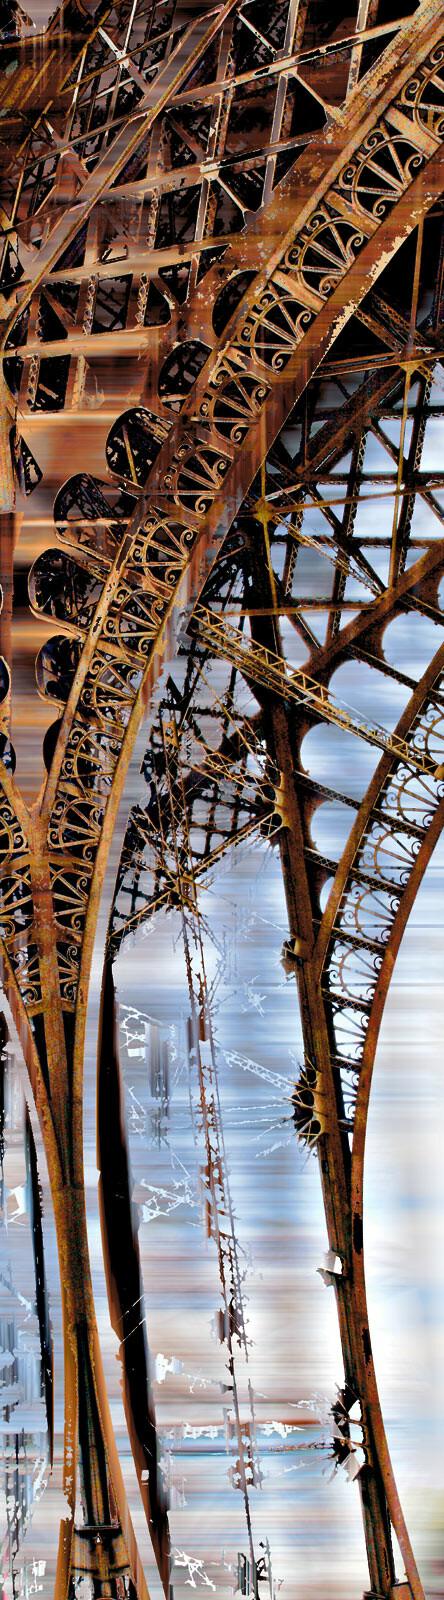 Paris Projections IX - Sabine Wild